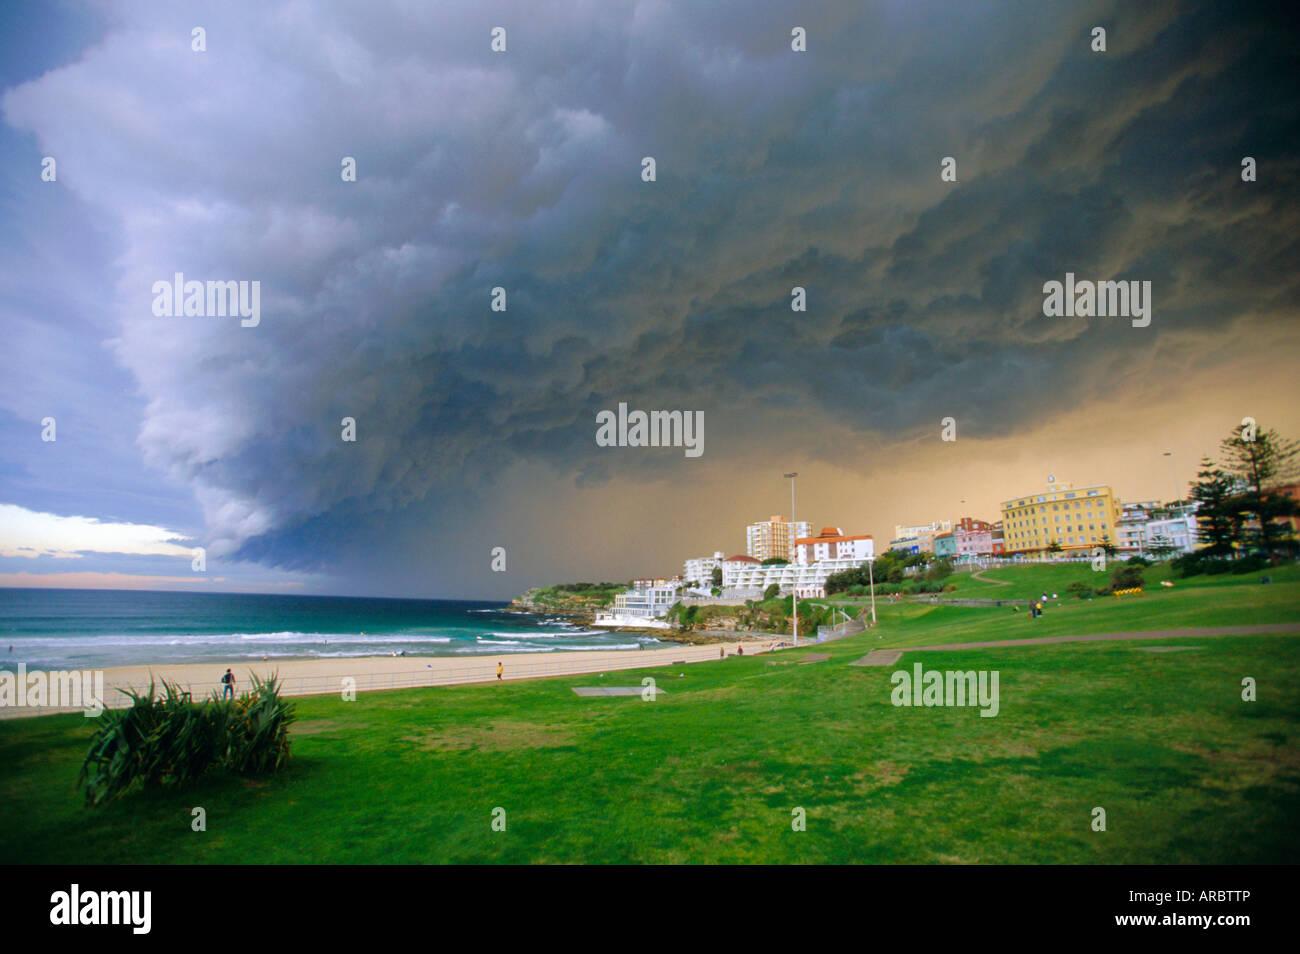 Thunderstorm advancing over Bondi Beach in the Eastern suburbs, Sydney, Australia - Stock Image